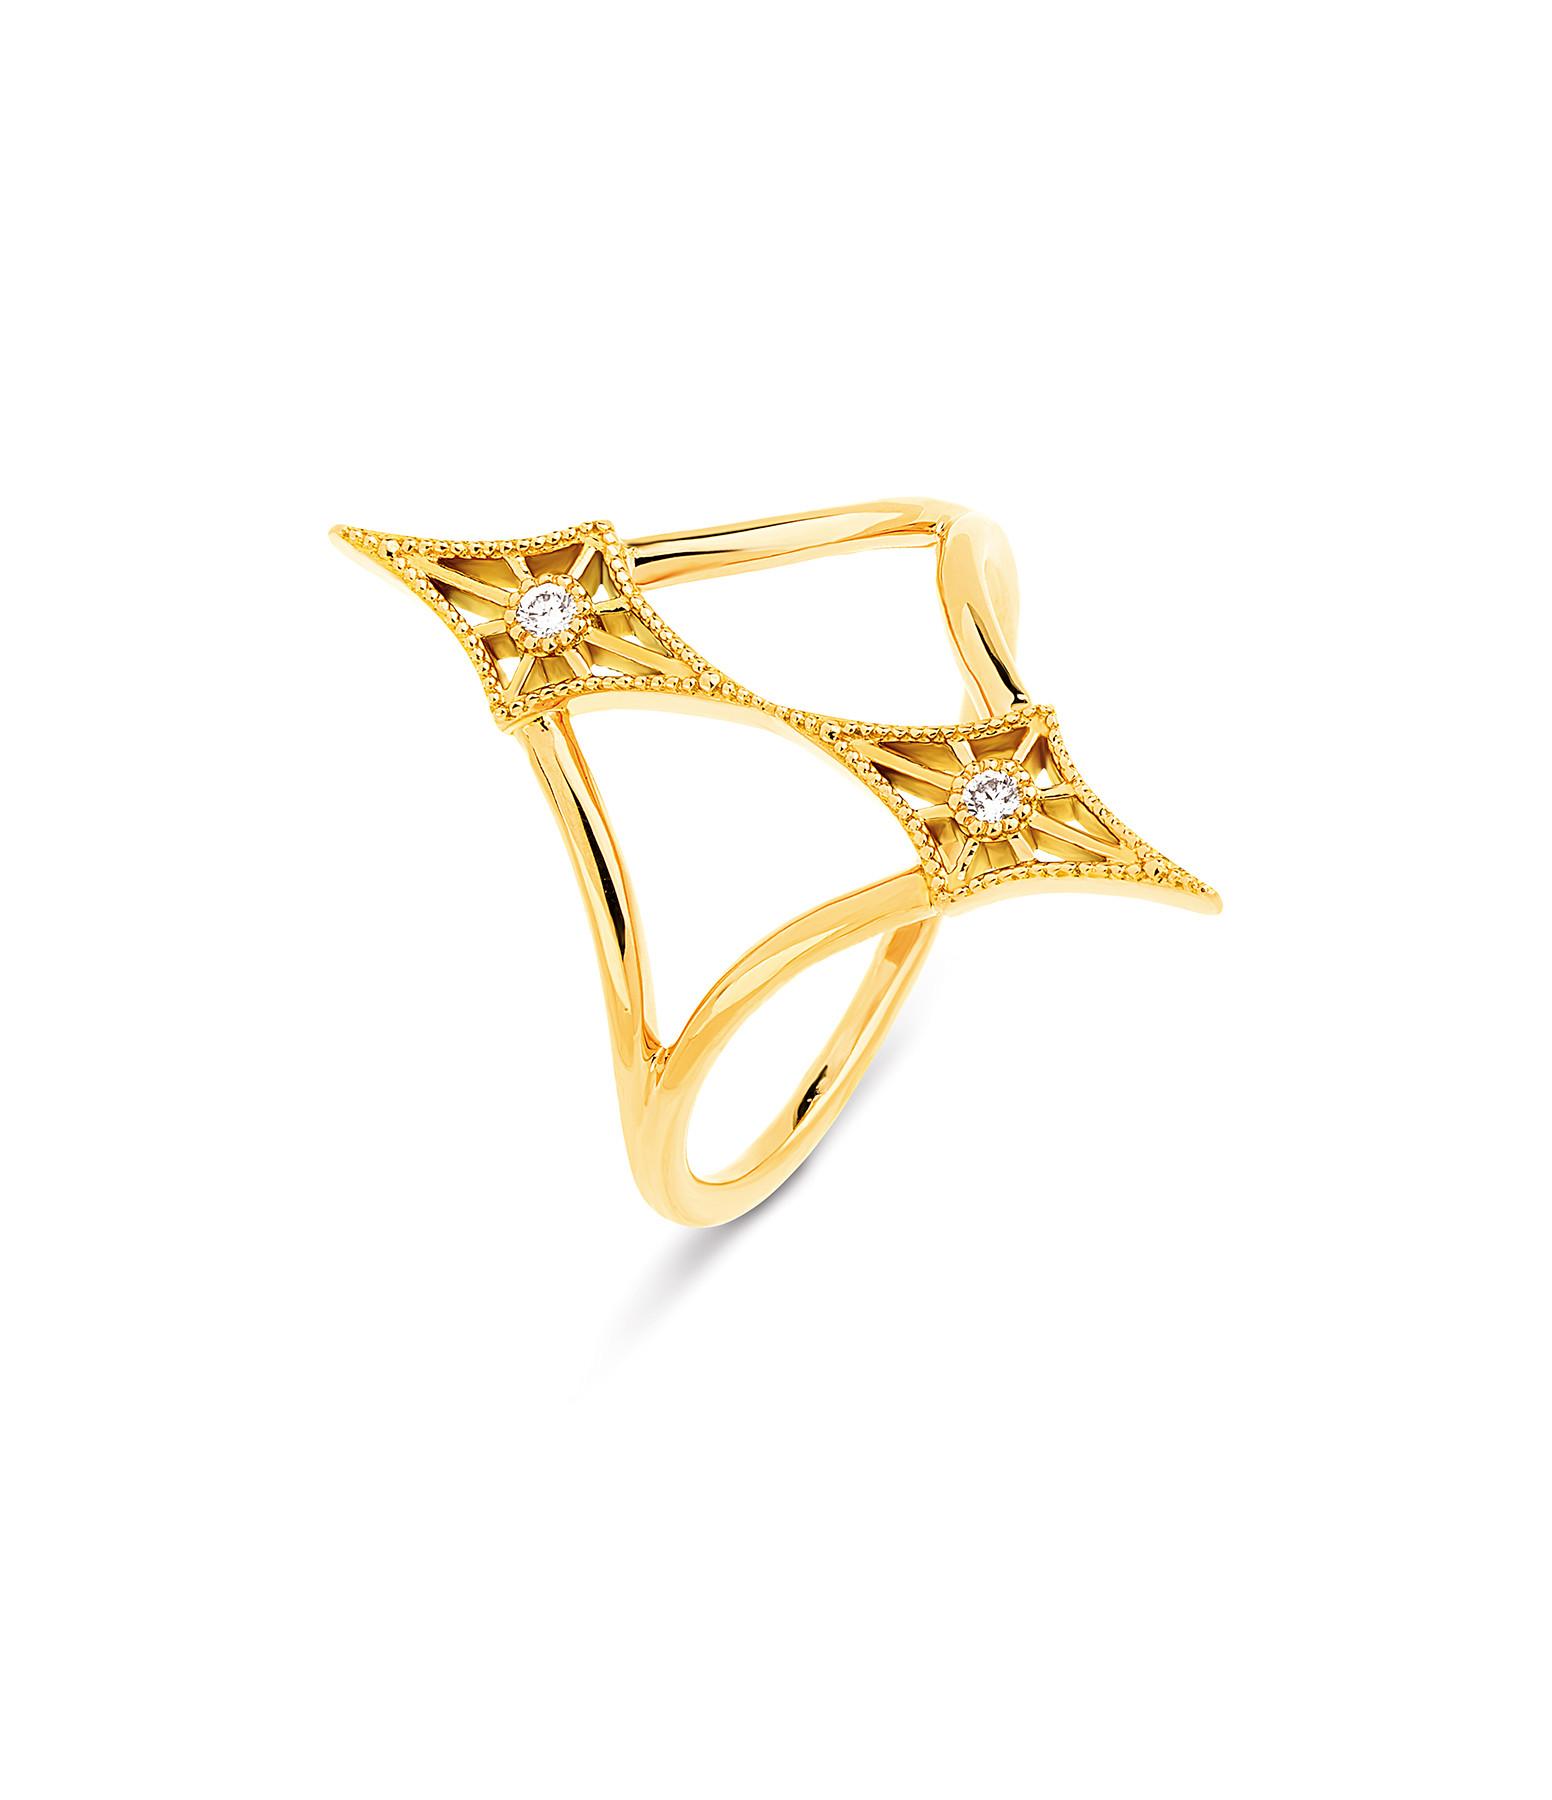 NAVA JOAILLERIE - Bague Cheyenne Losange Double Diamants Or Jaune